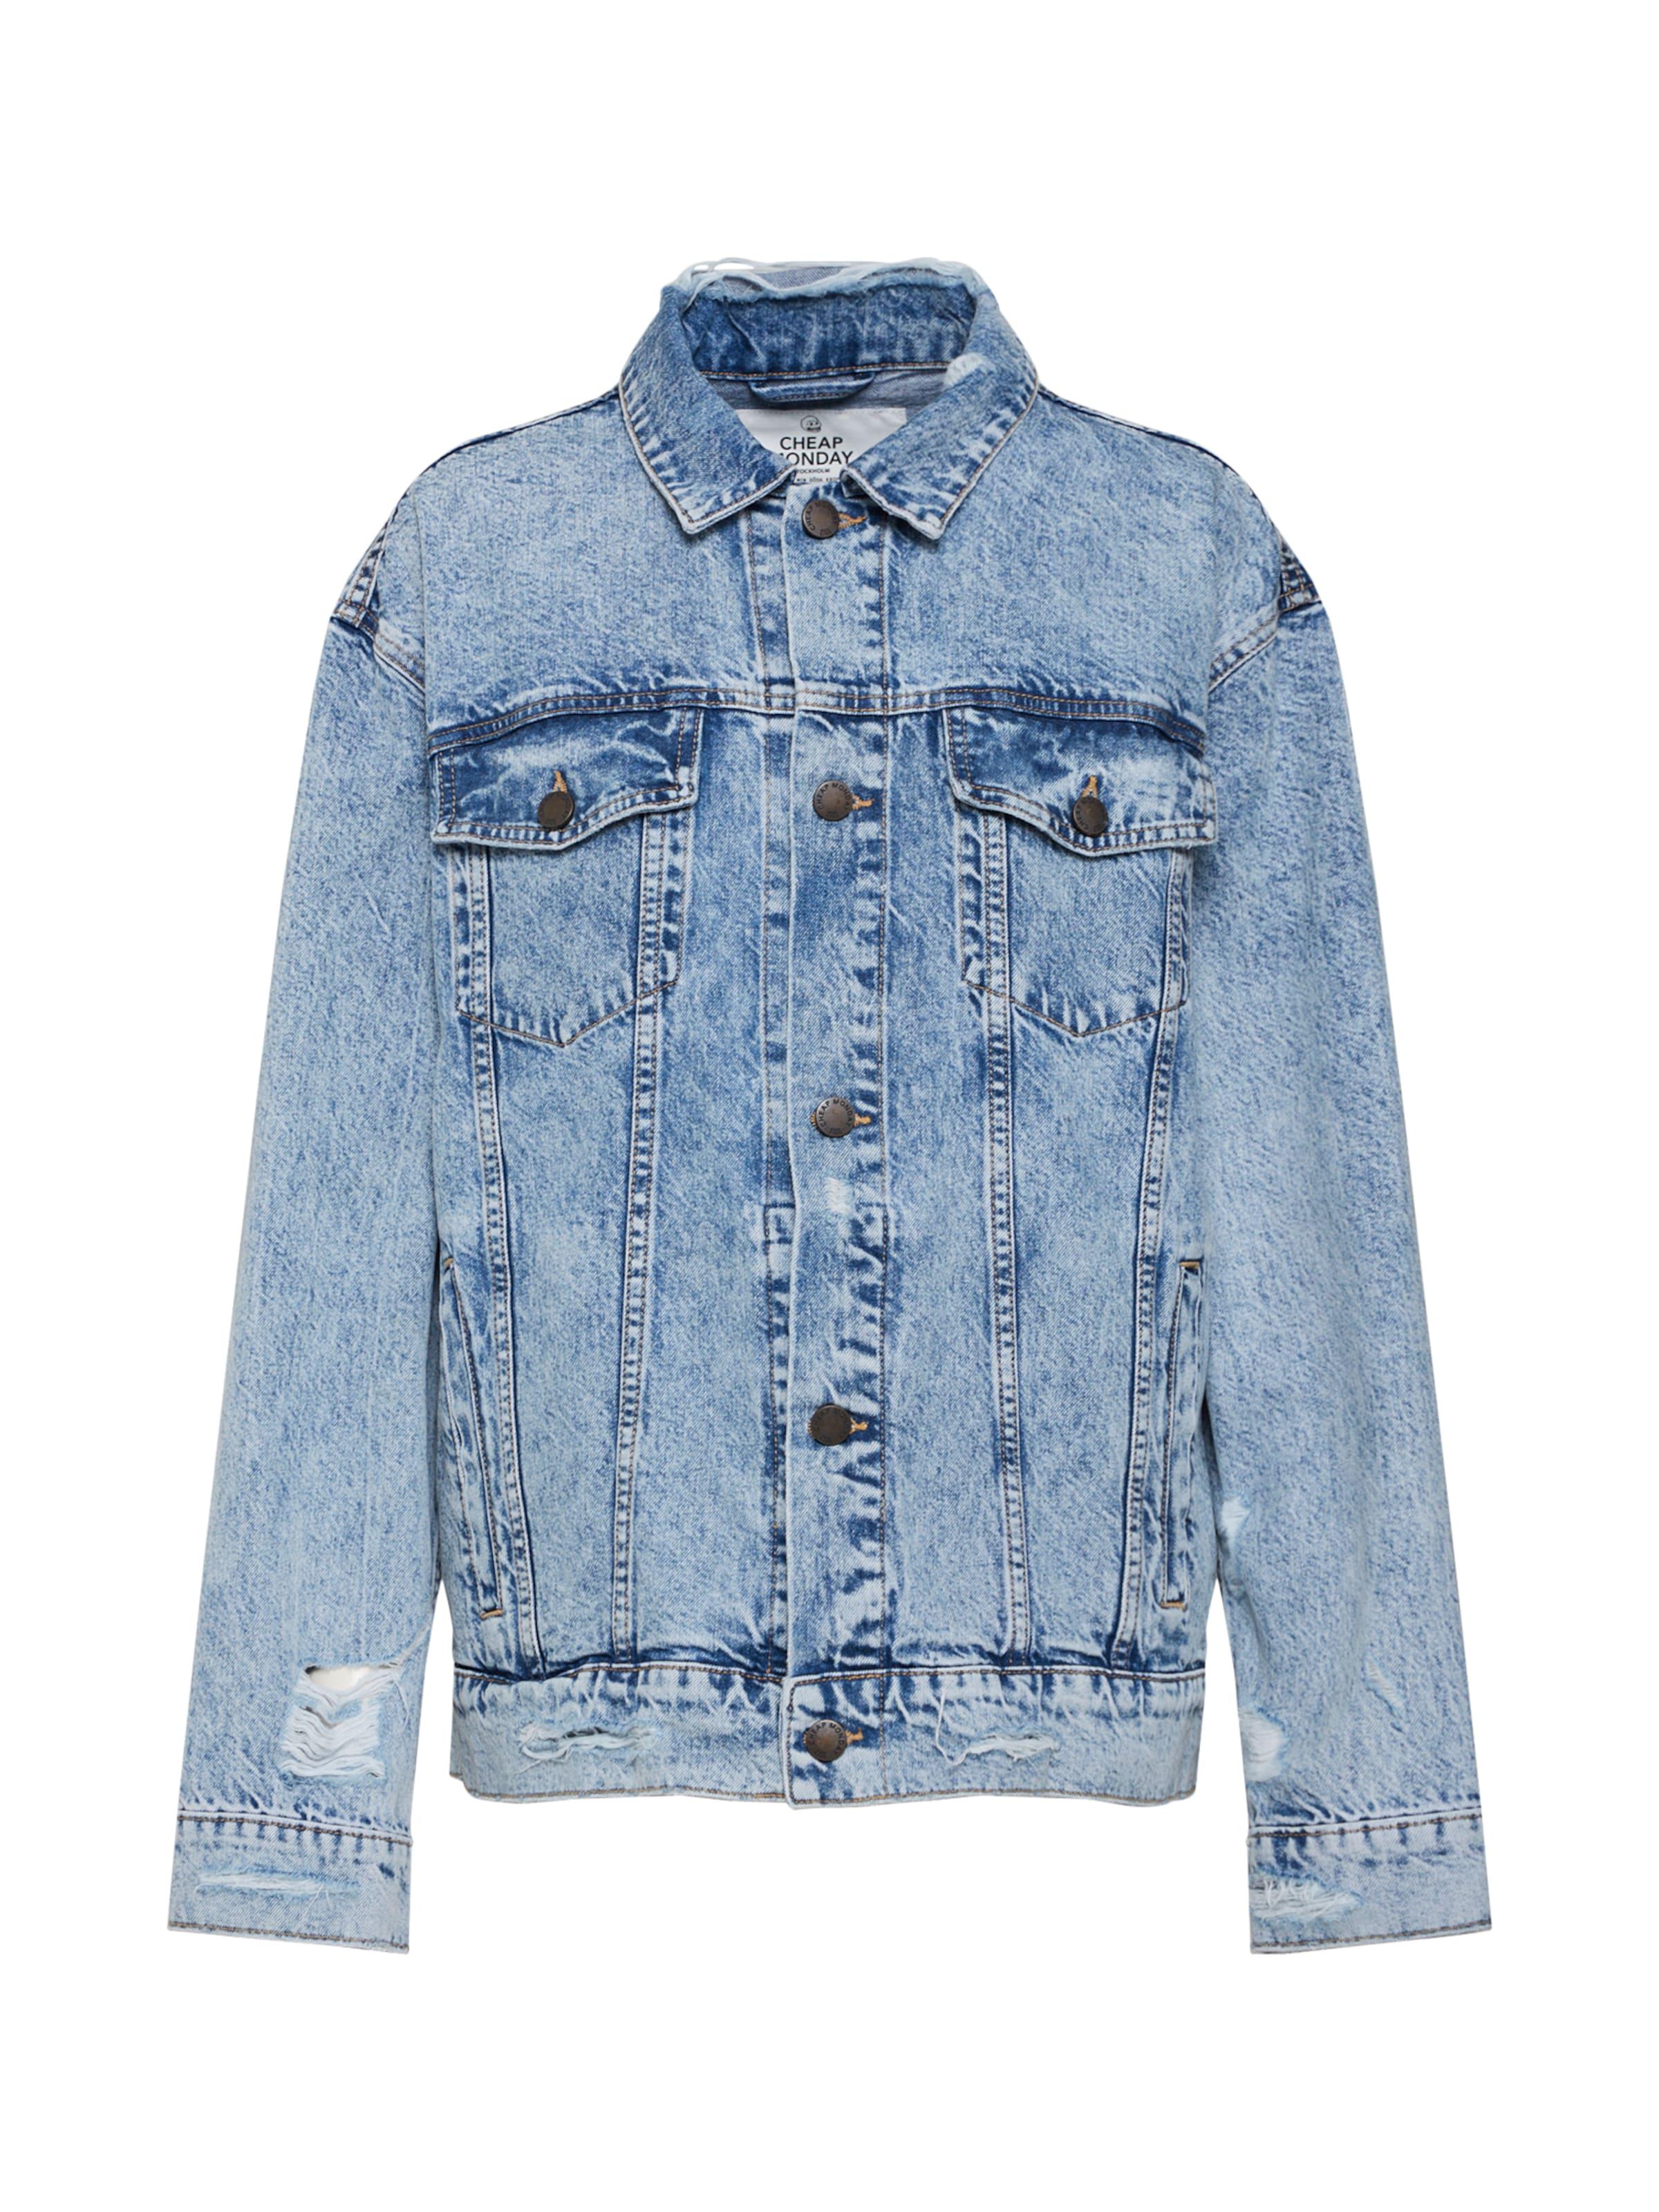 In Bleu Jacket' Cheap saison MondayVeste Mi 'upsize 2WHID9EY